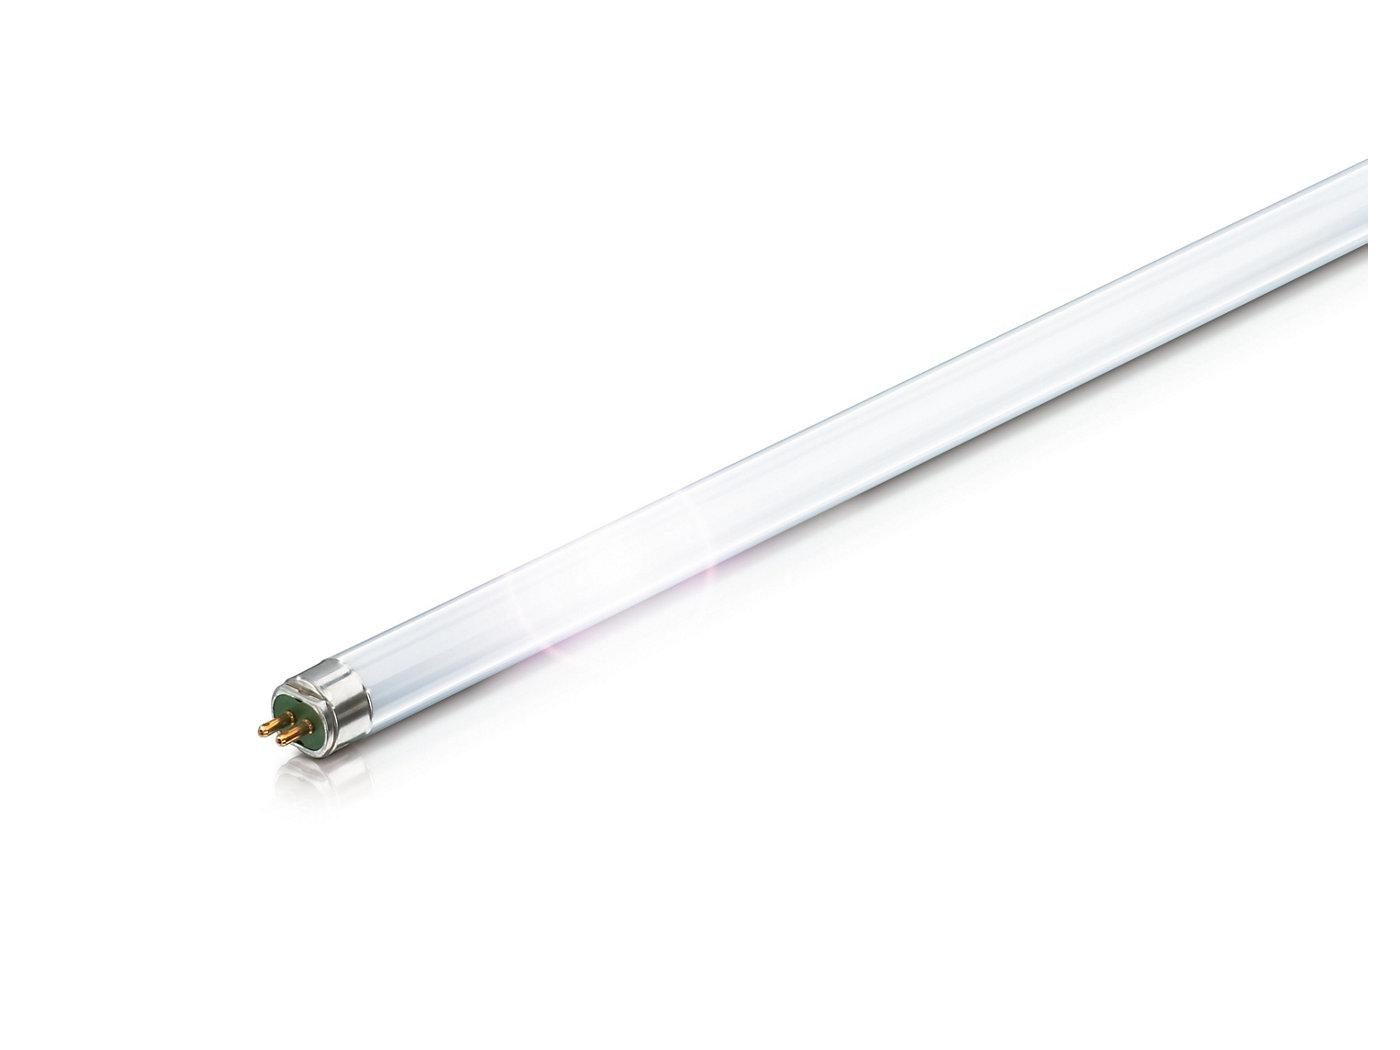 PHILIPS飛利浦 T5 Essential易省節能燈管 (4尺28W) 4000K自然光 T5燈管